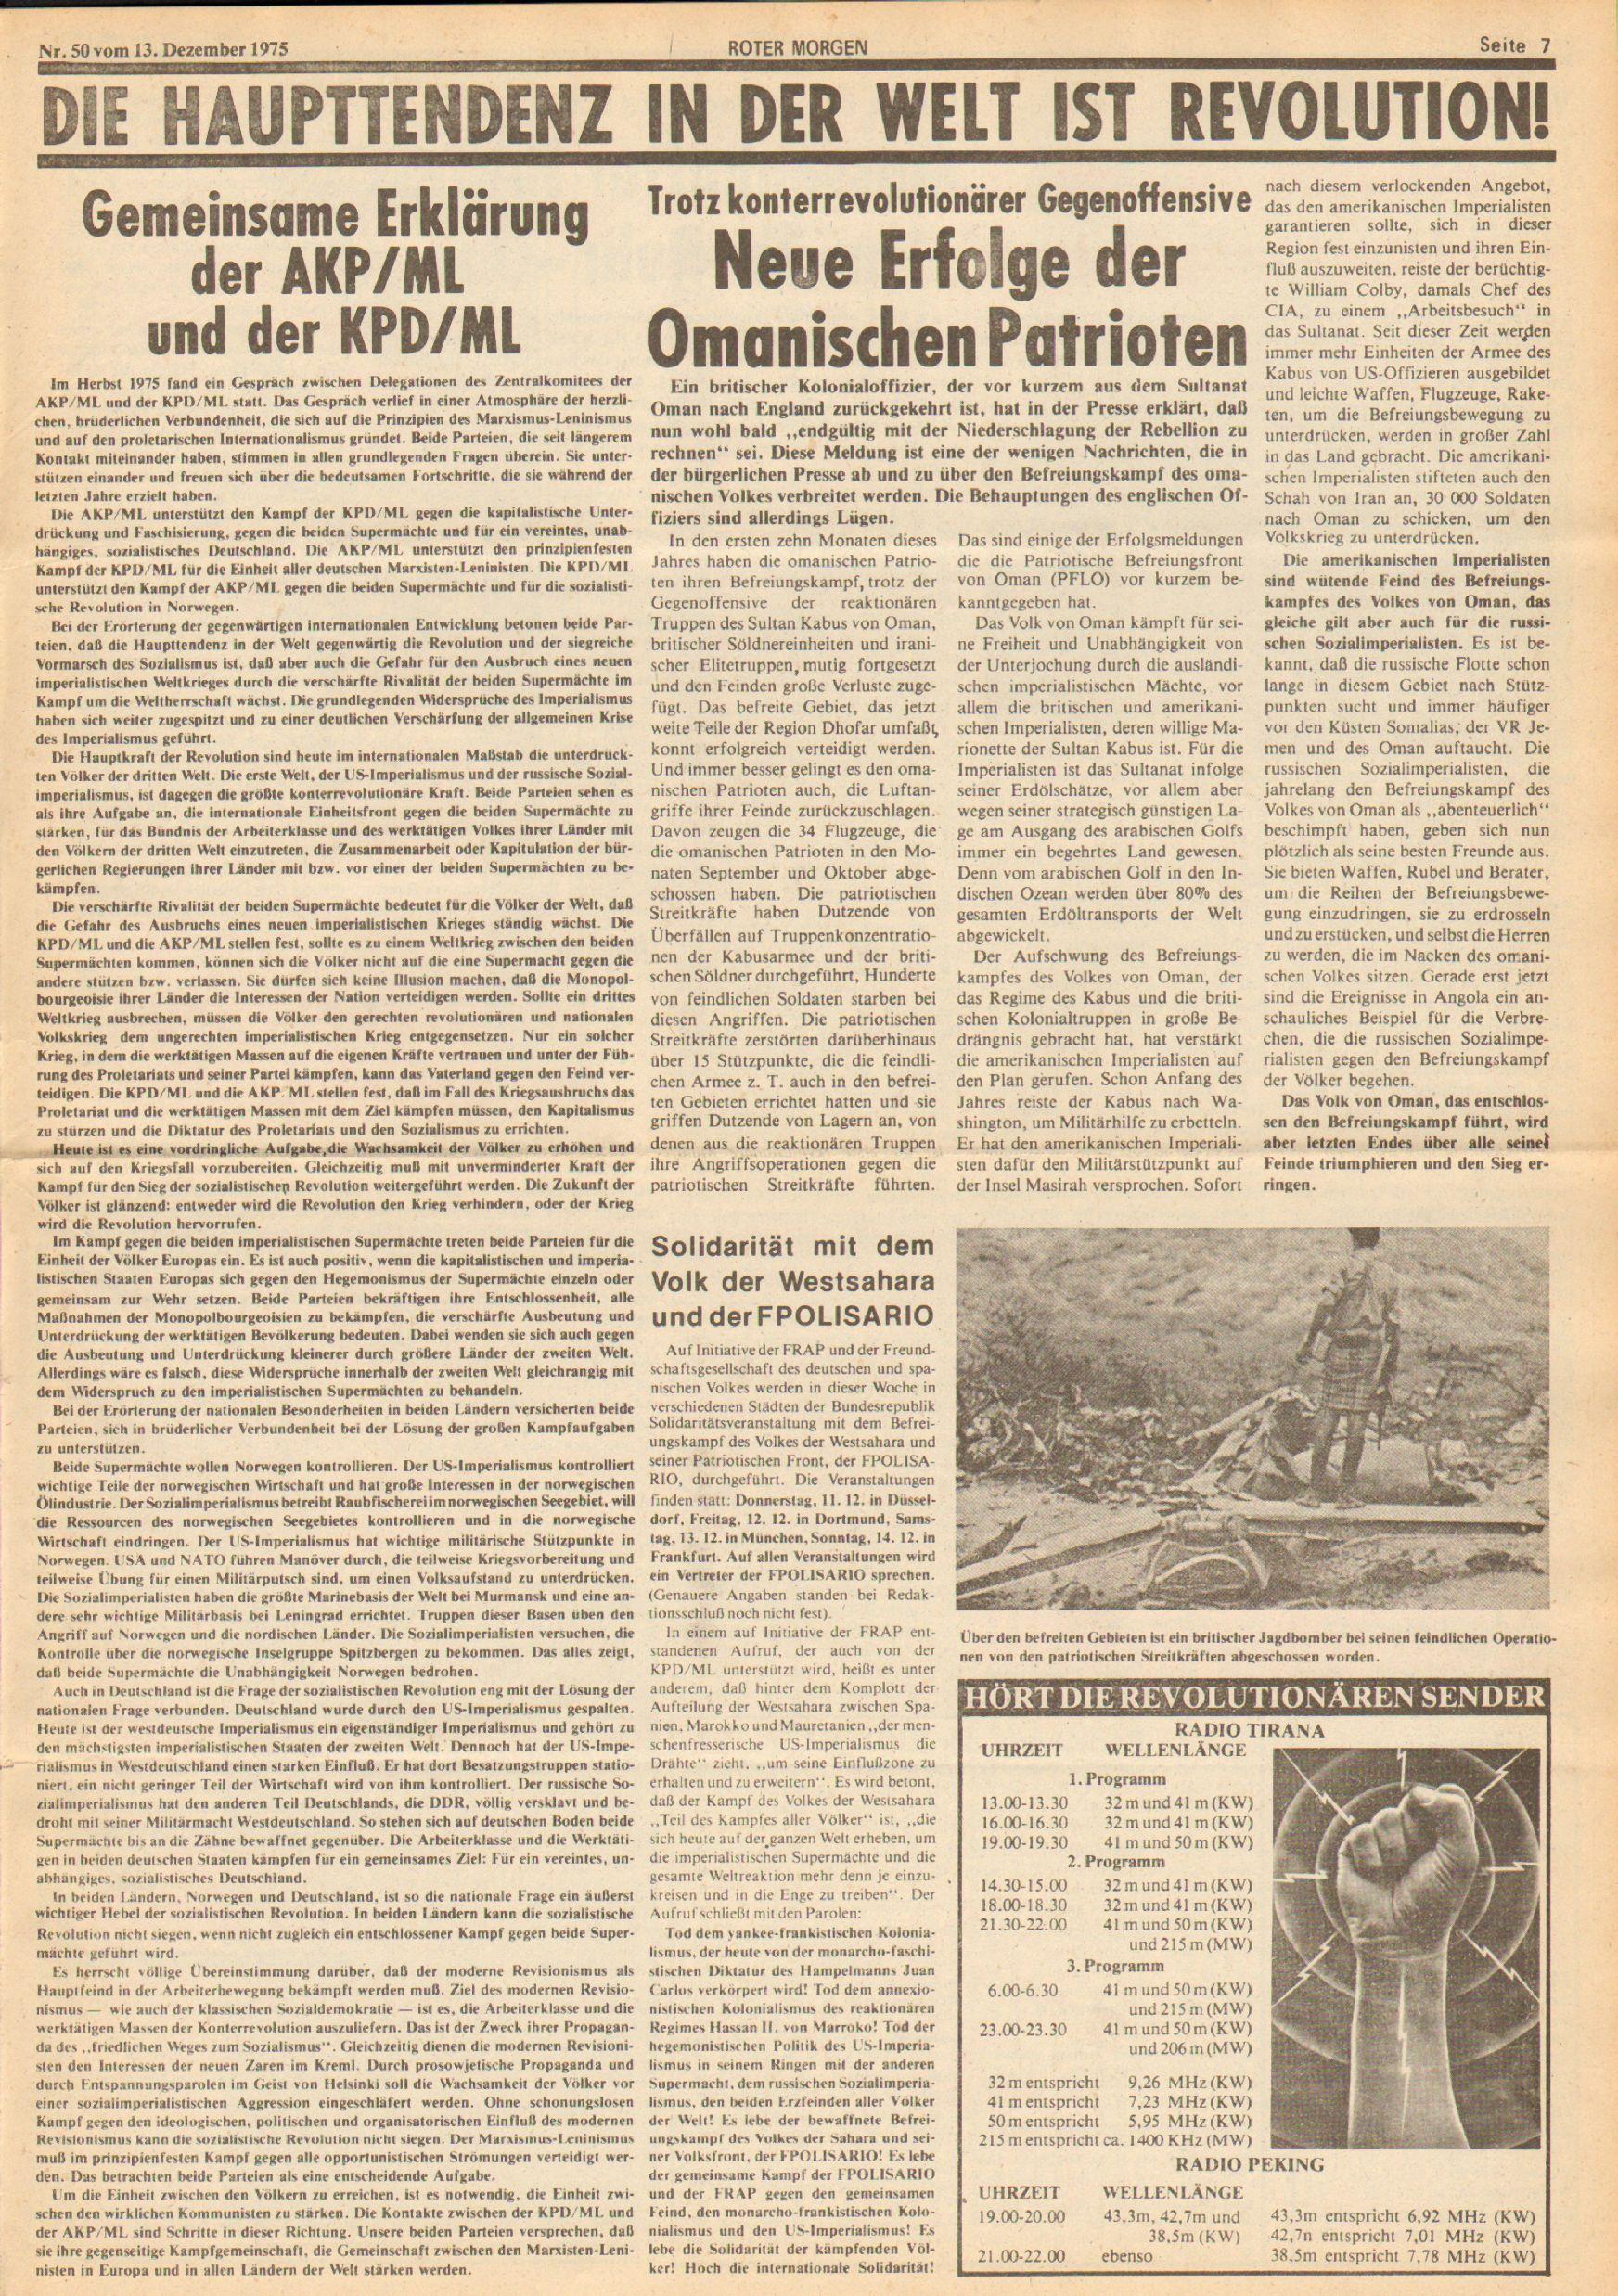 Roter Morgen, 9. Jg., 13. Dezember 1975, Nr. 50, Seite 7